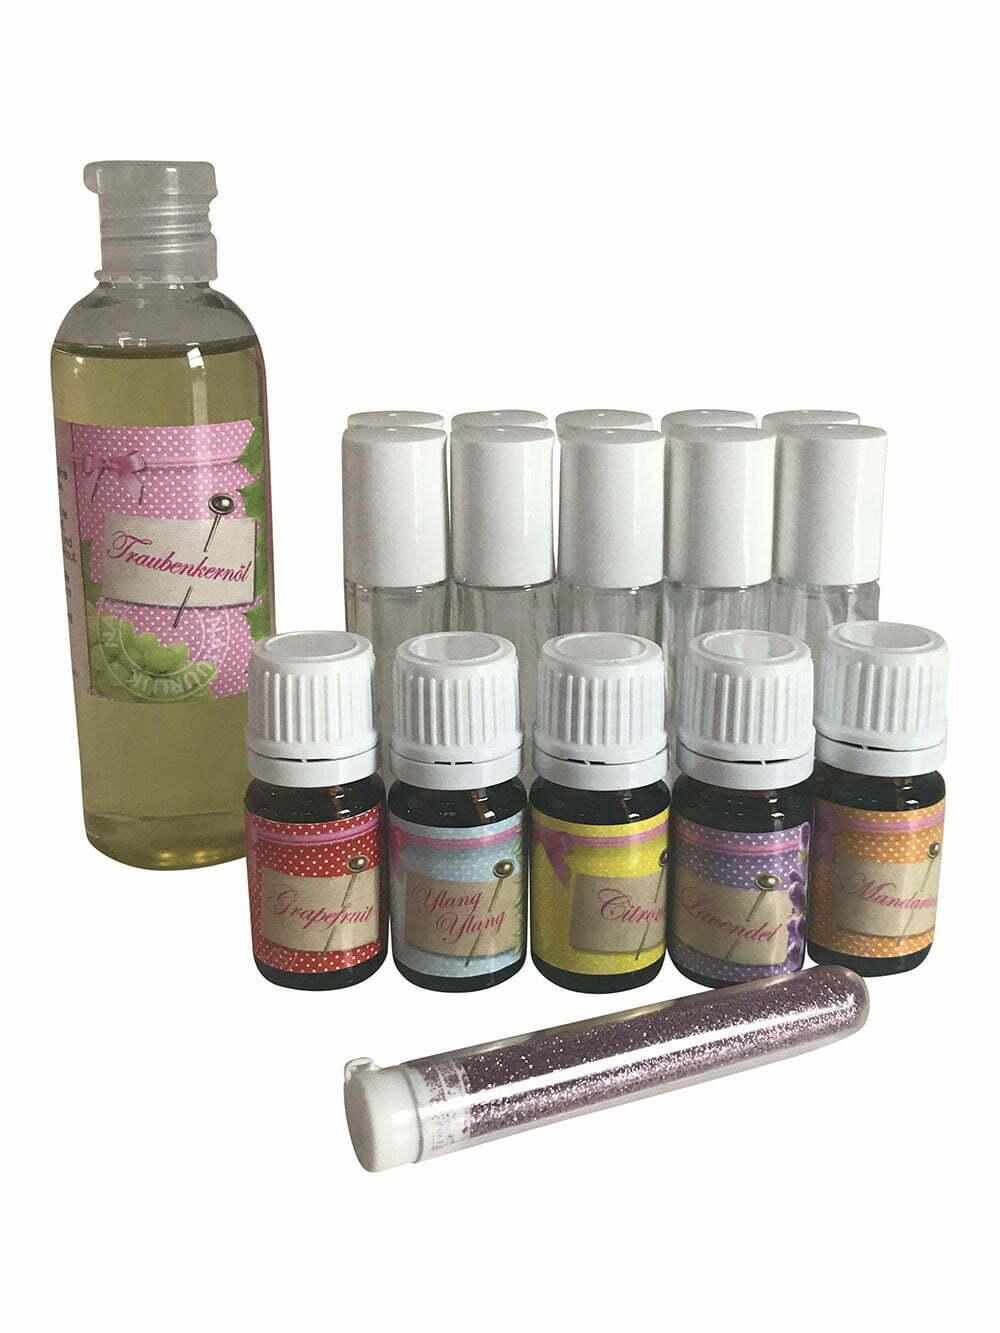 Kinderparty Parfum selber herstellen